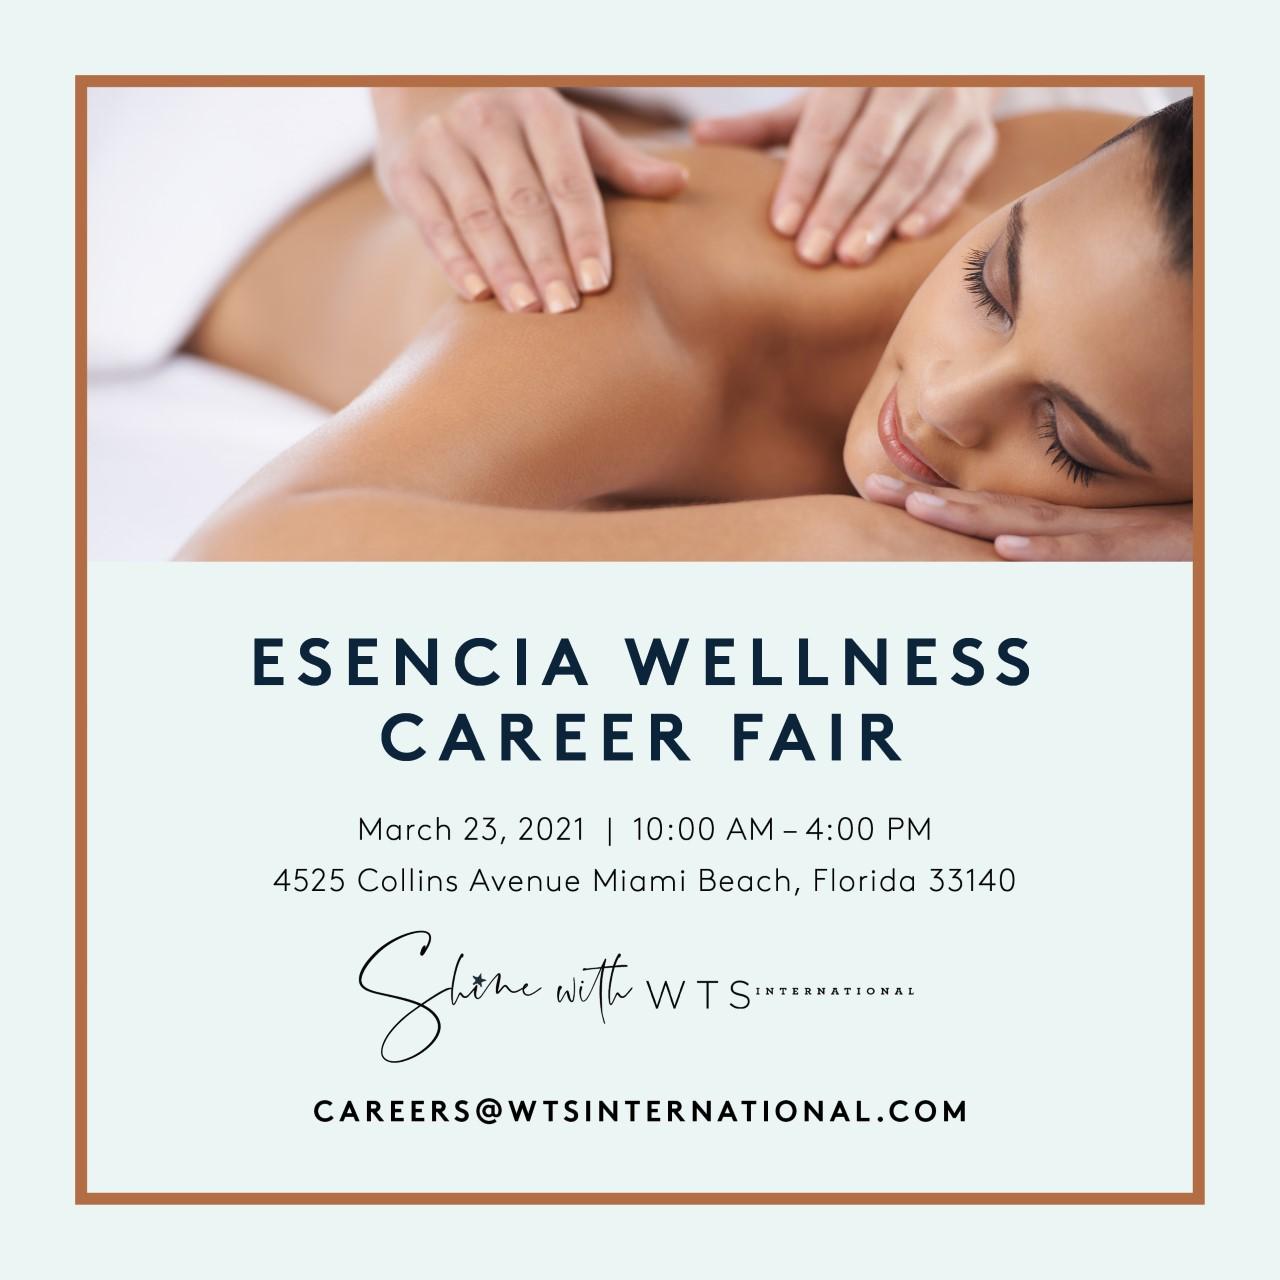 Essencia Wellness Career Fair Ad